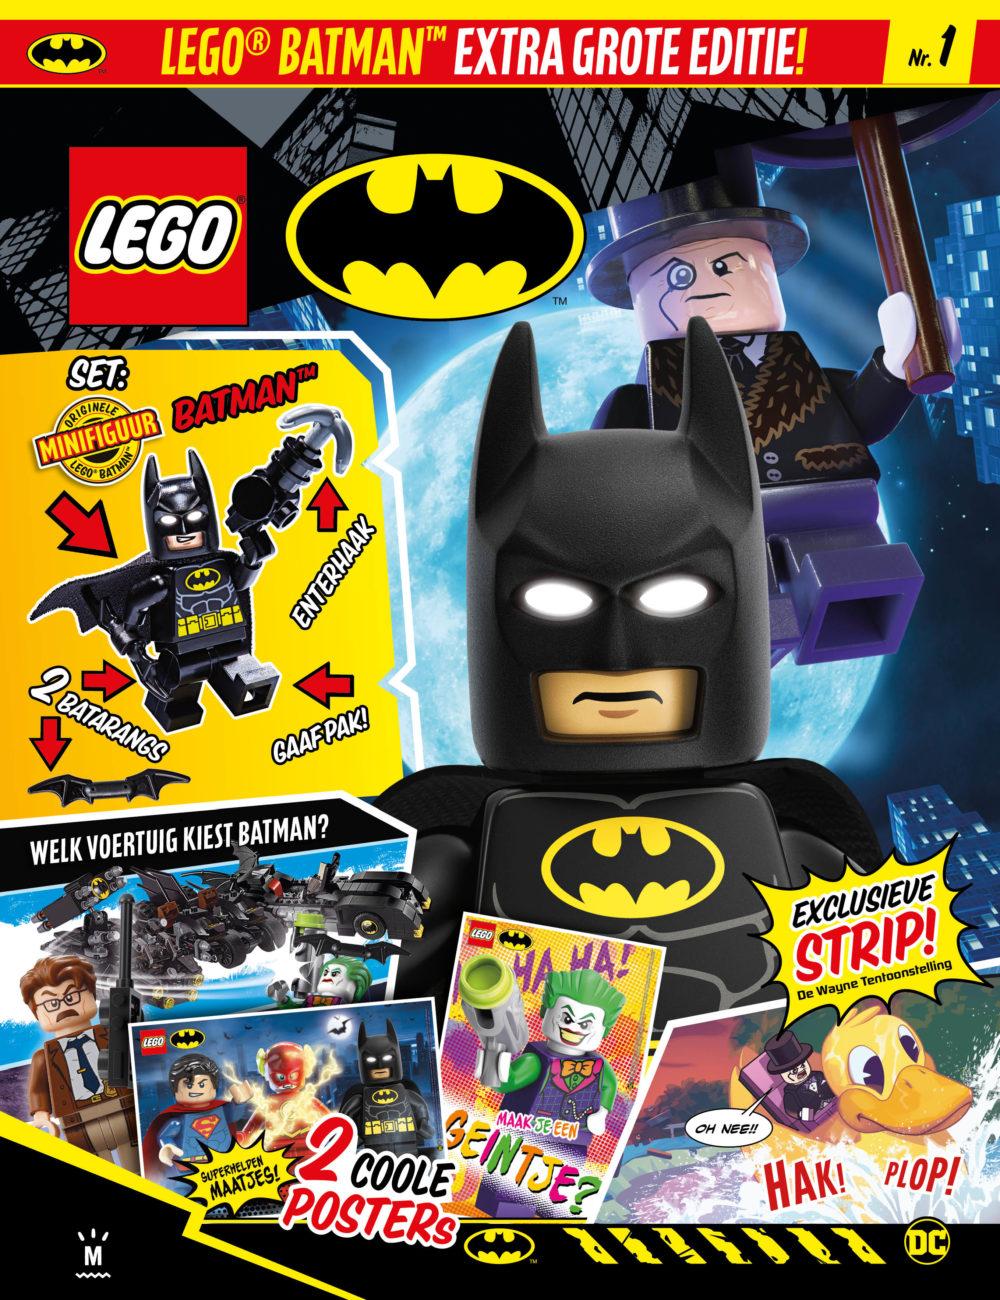 LEGO Batman magazine 2020